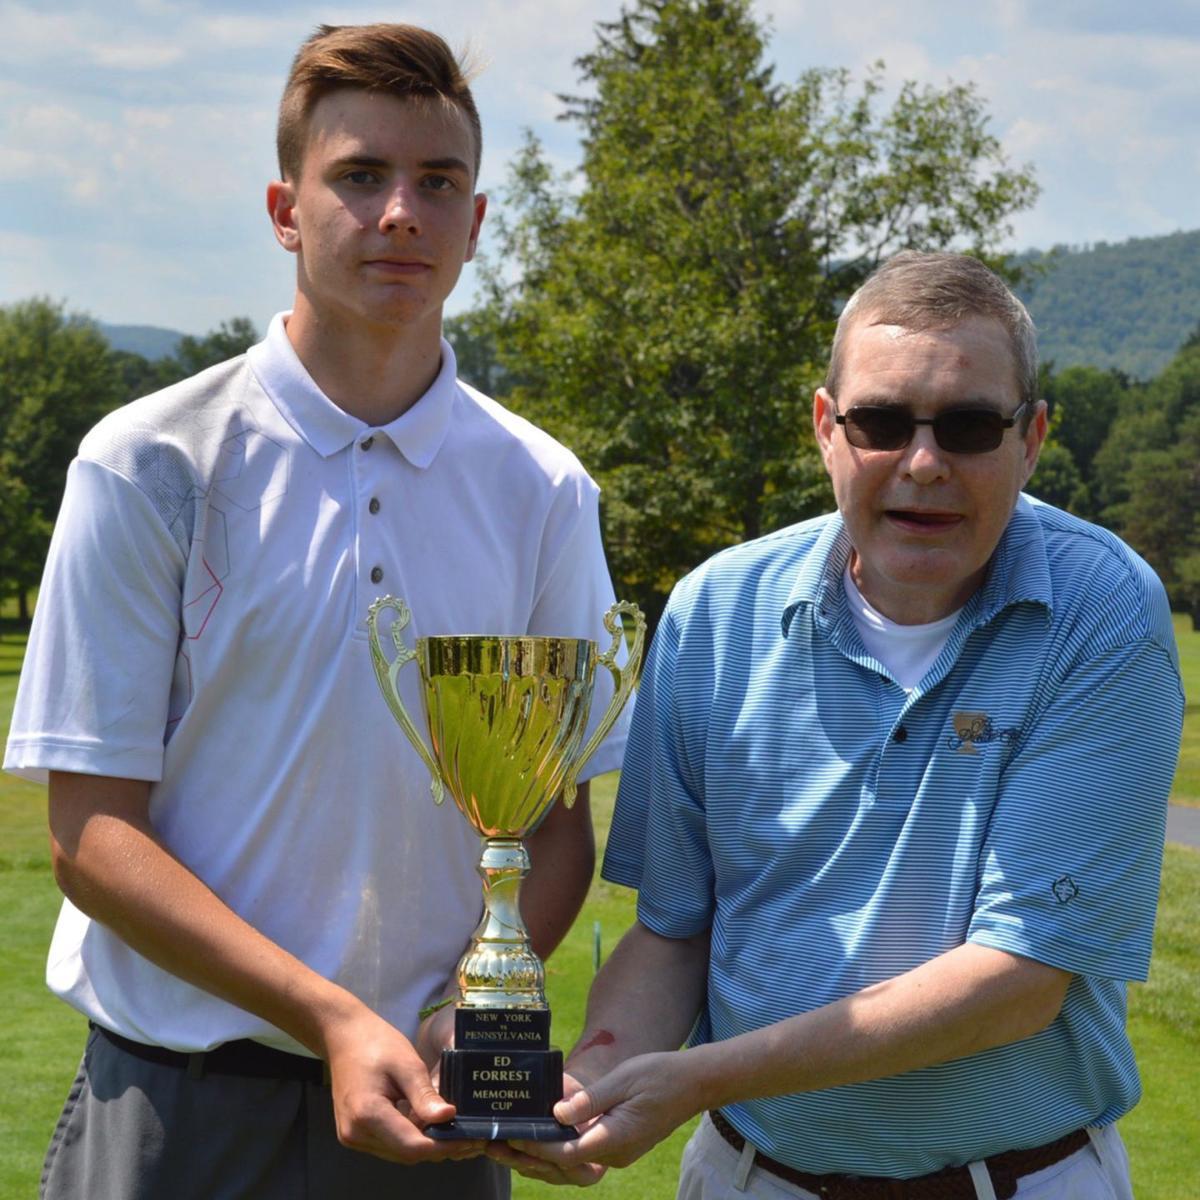 Penn York Ed Forrest Cup trophy